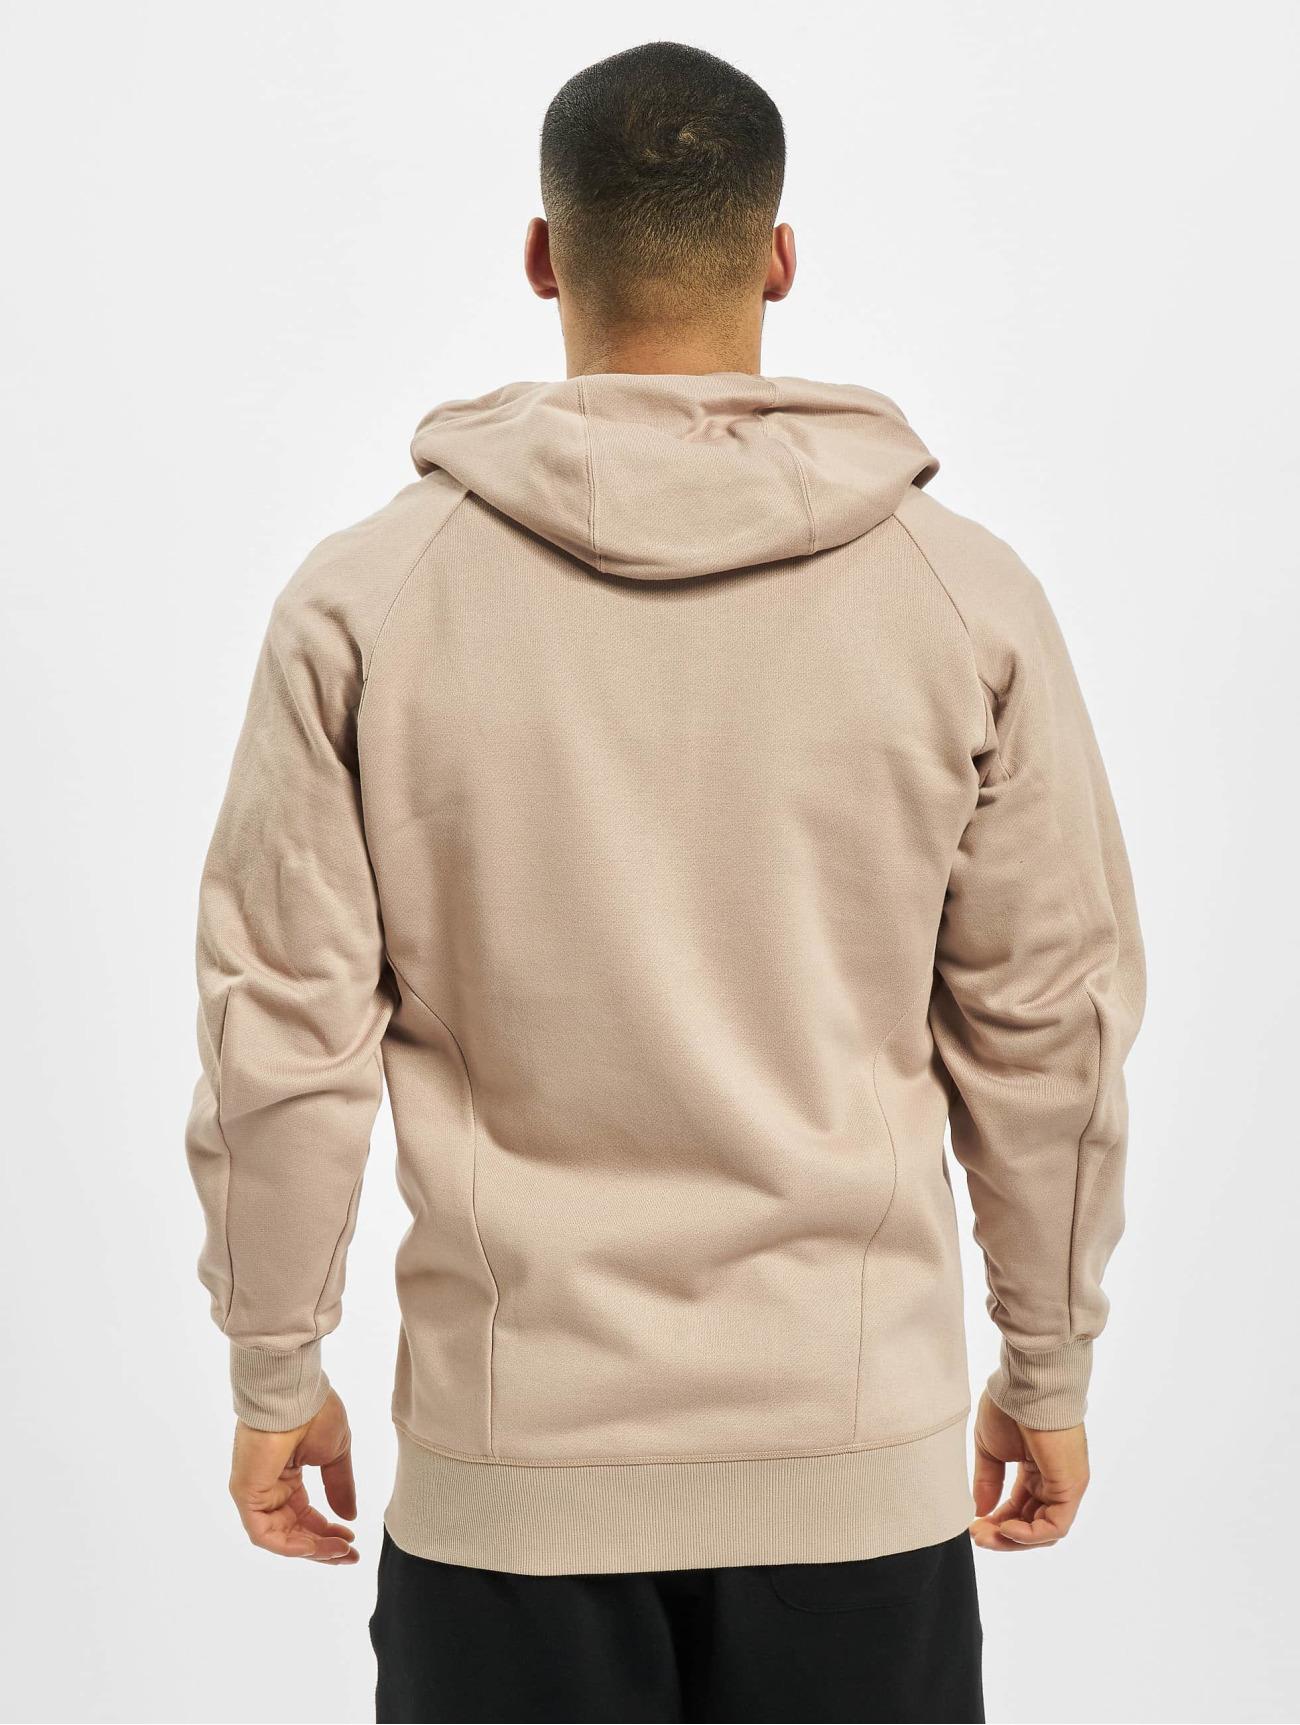 adidas Originals   XBYO   brun Homme Sweat capuche zippé  558044  Homme Hauts